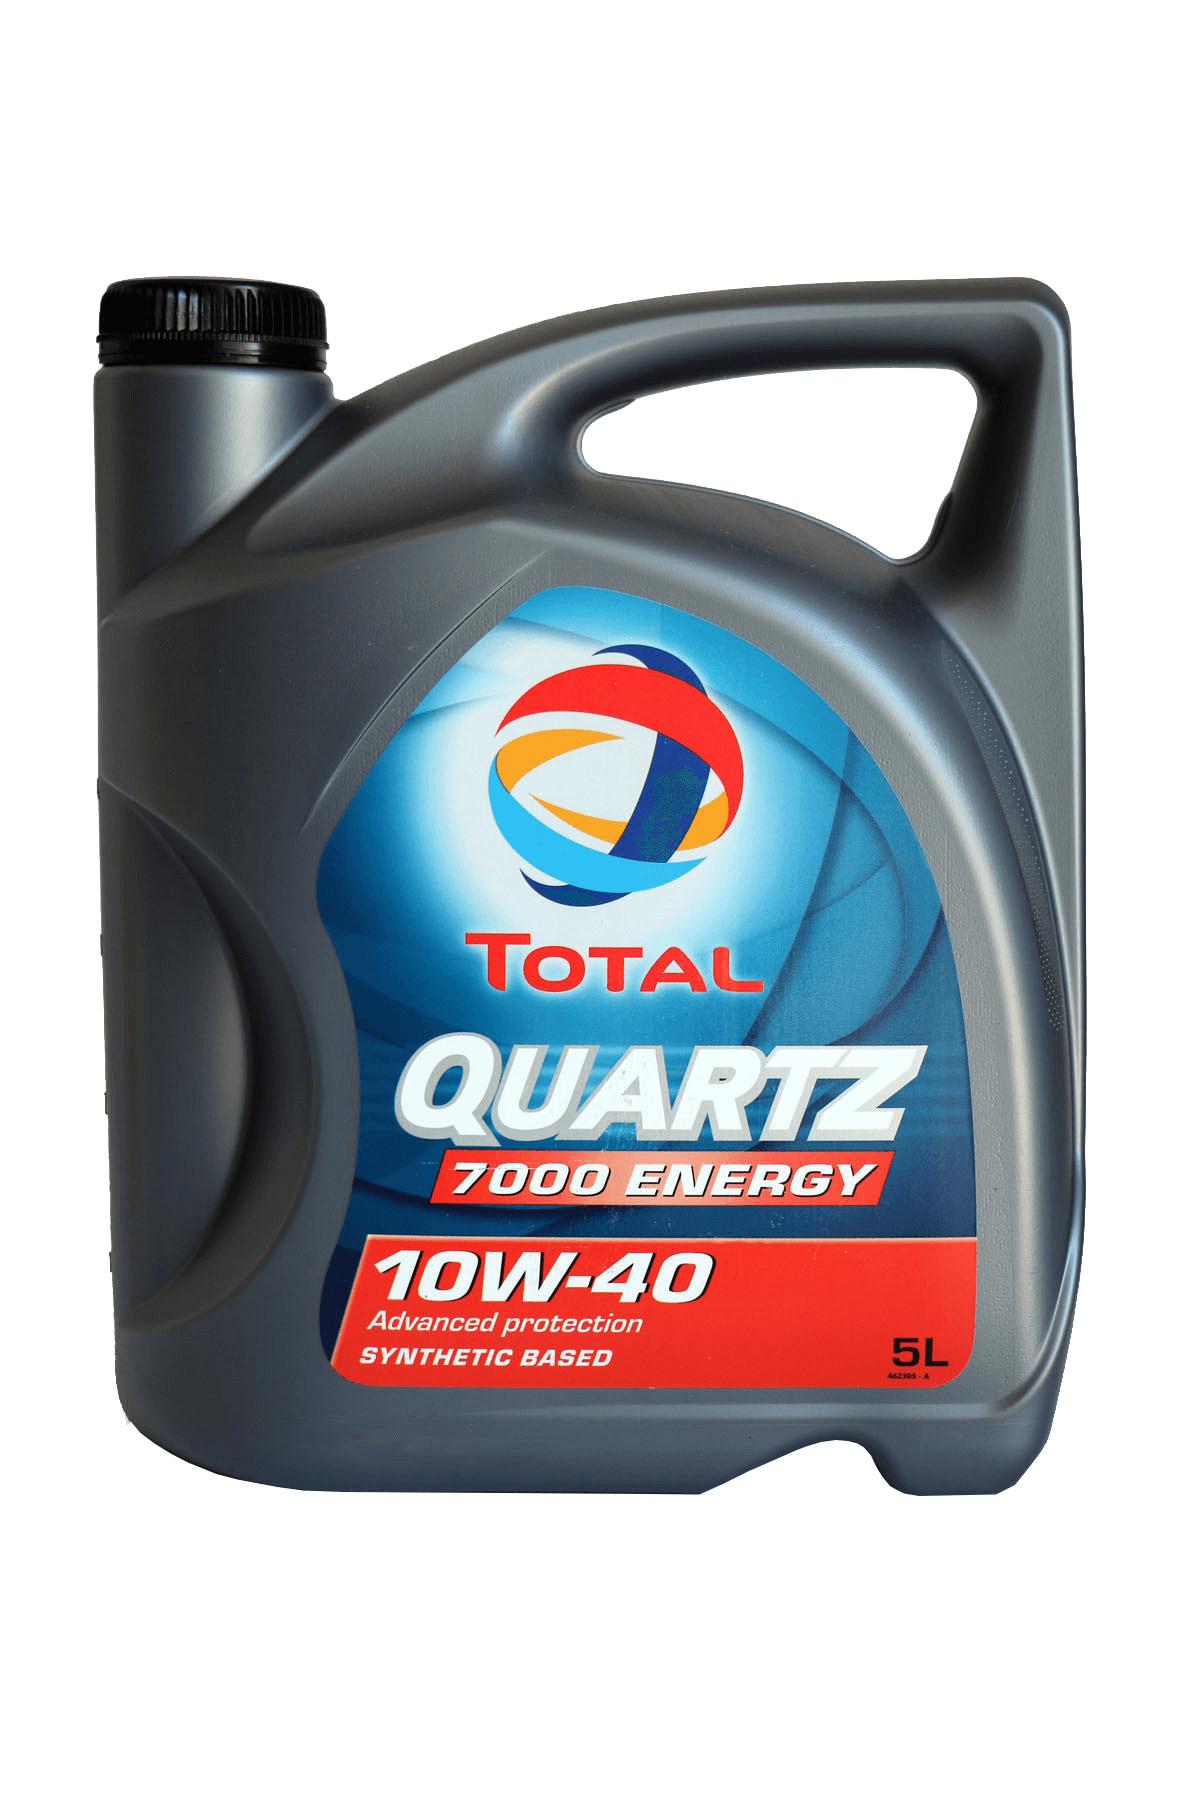 Total Quartz 7000 ENERGY 10W-40 Motoröl, 5l